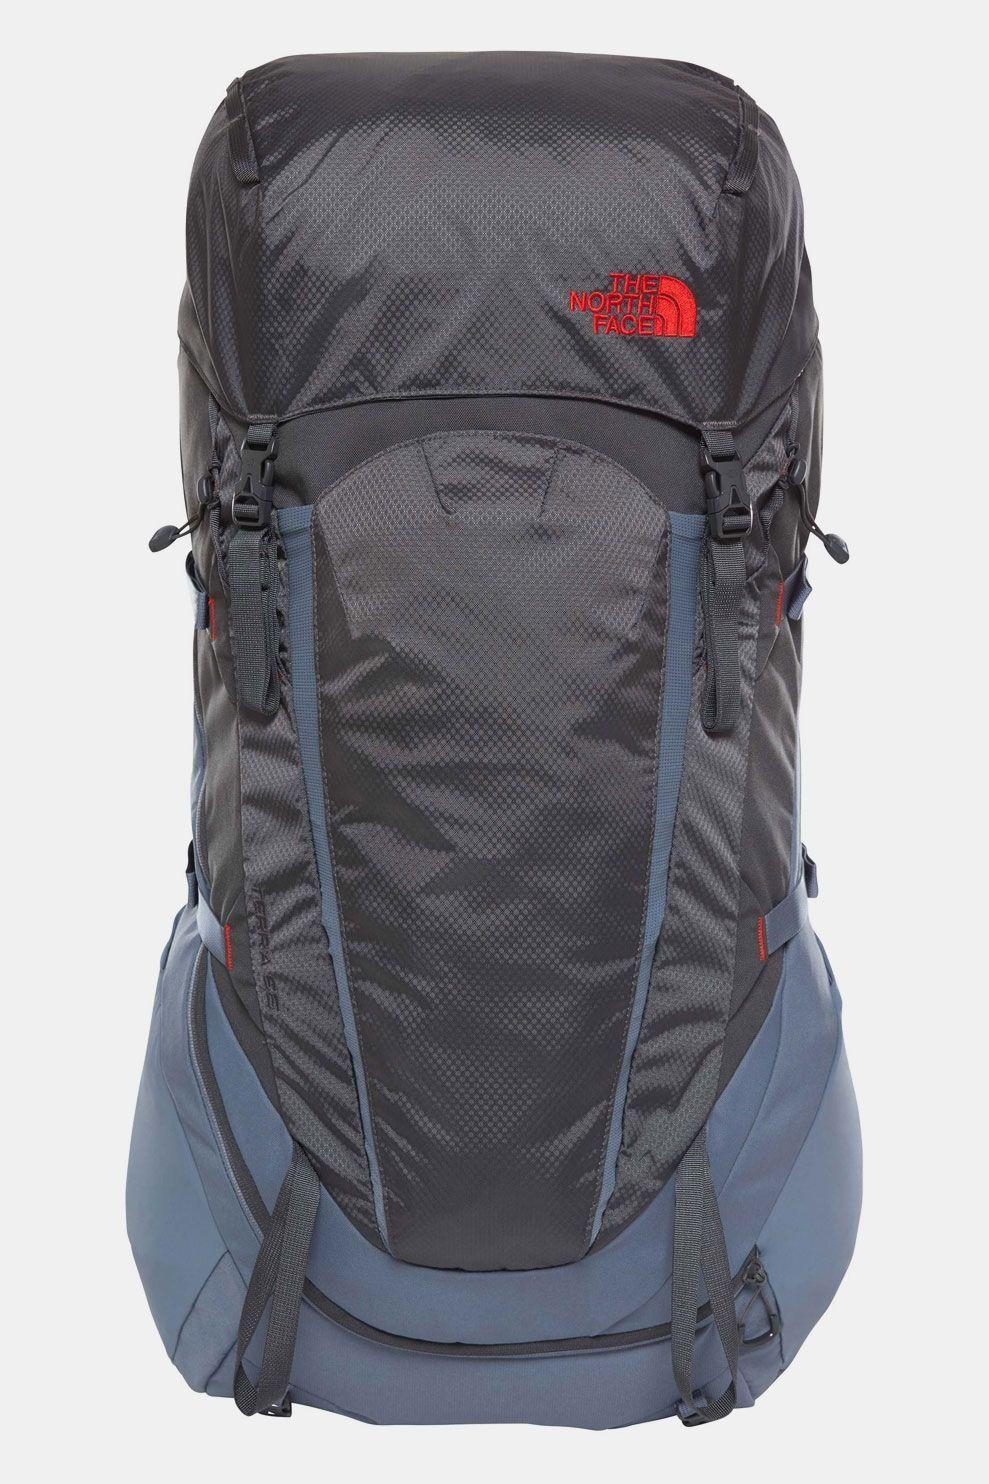 The North Face Terra 65 Liter Backpack AW20 Donkergrijs/Middengrijs